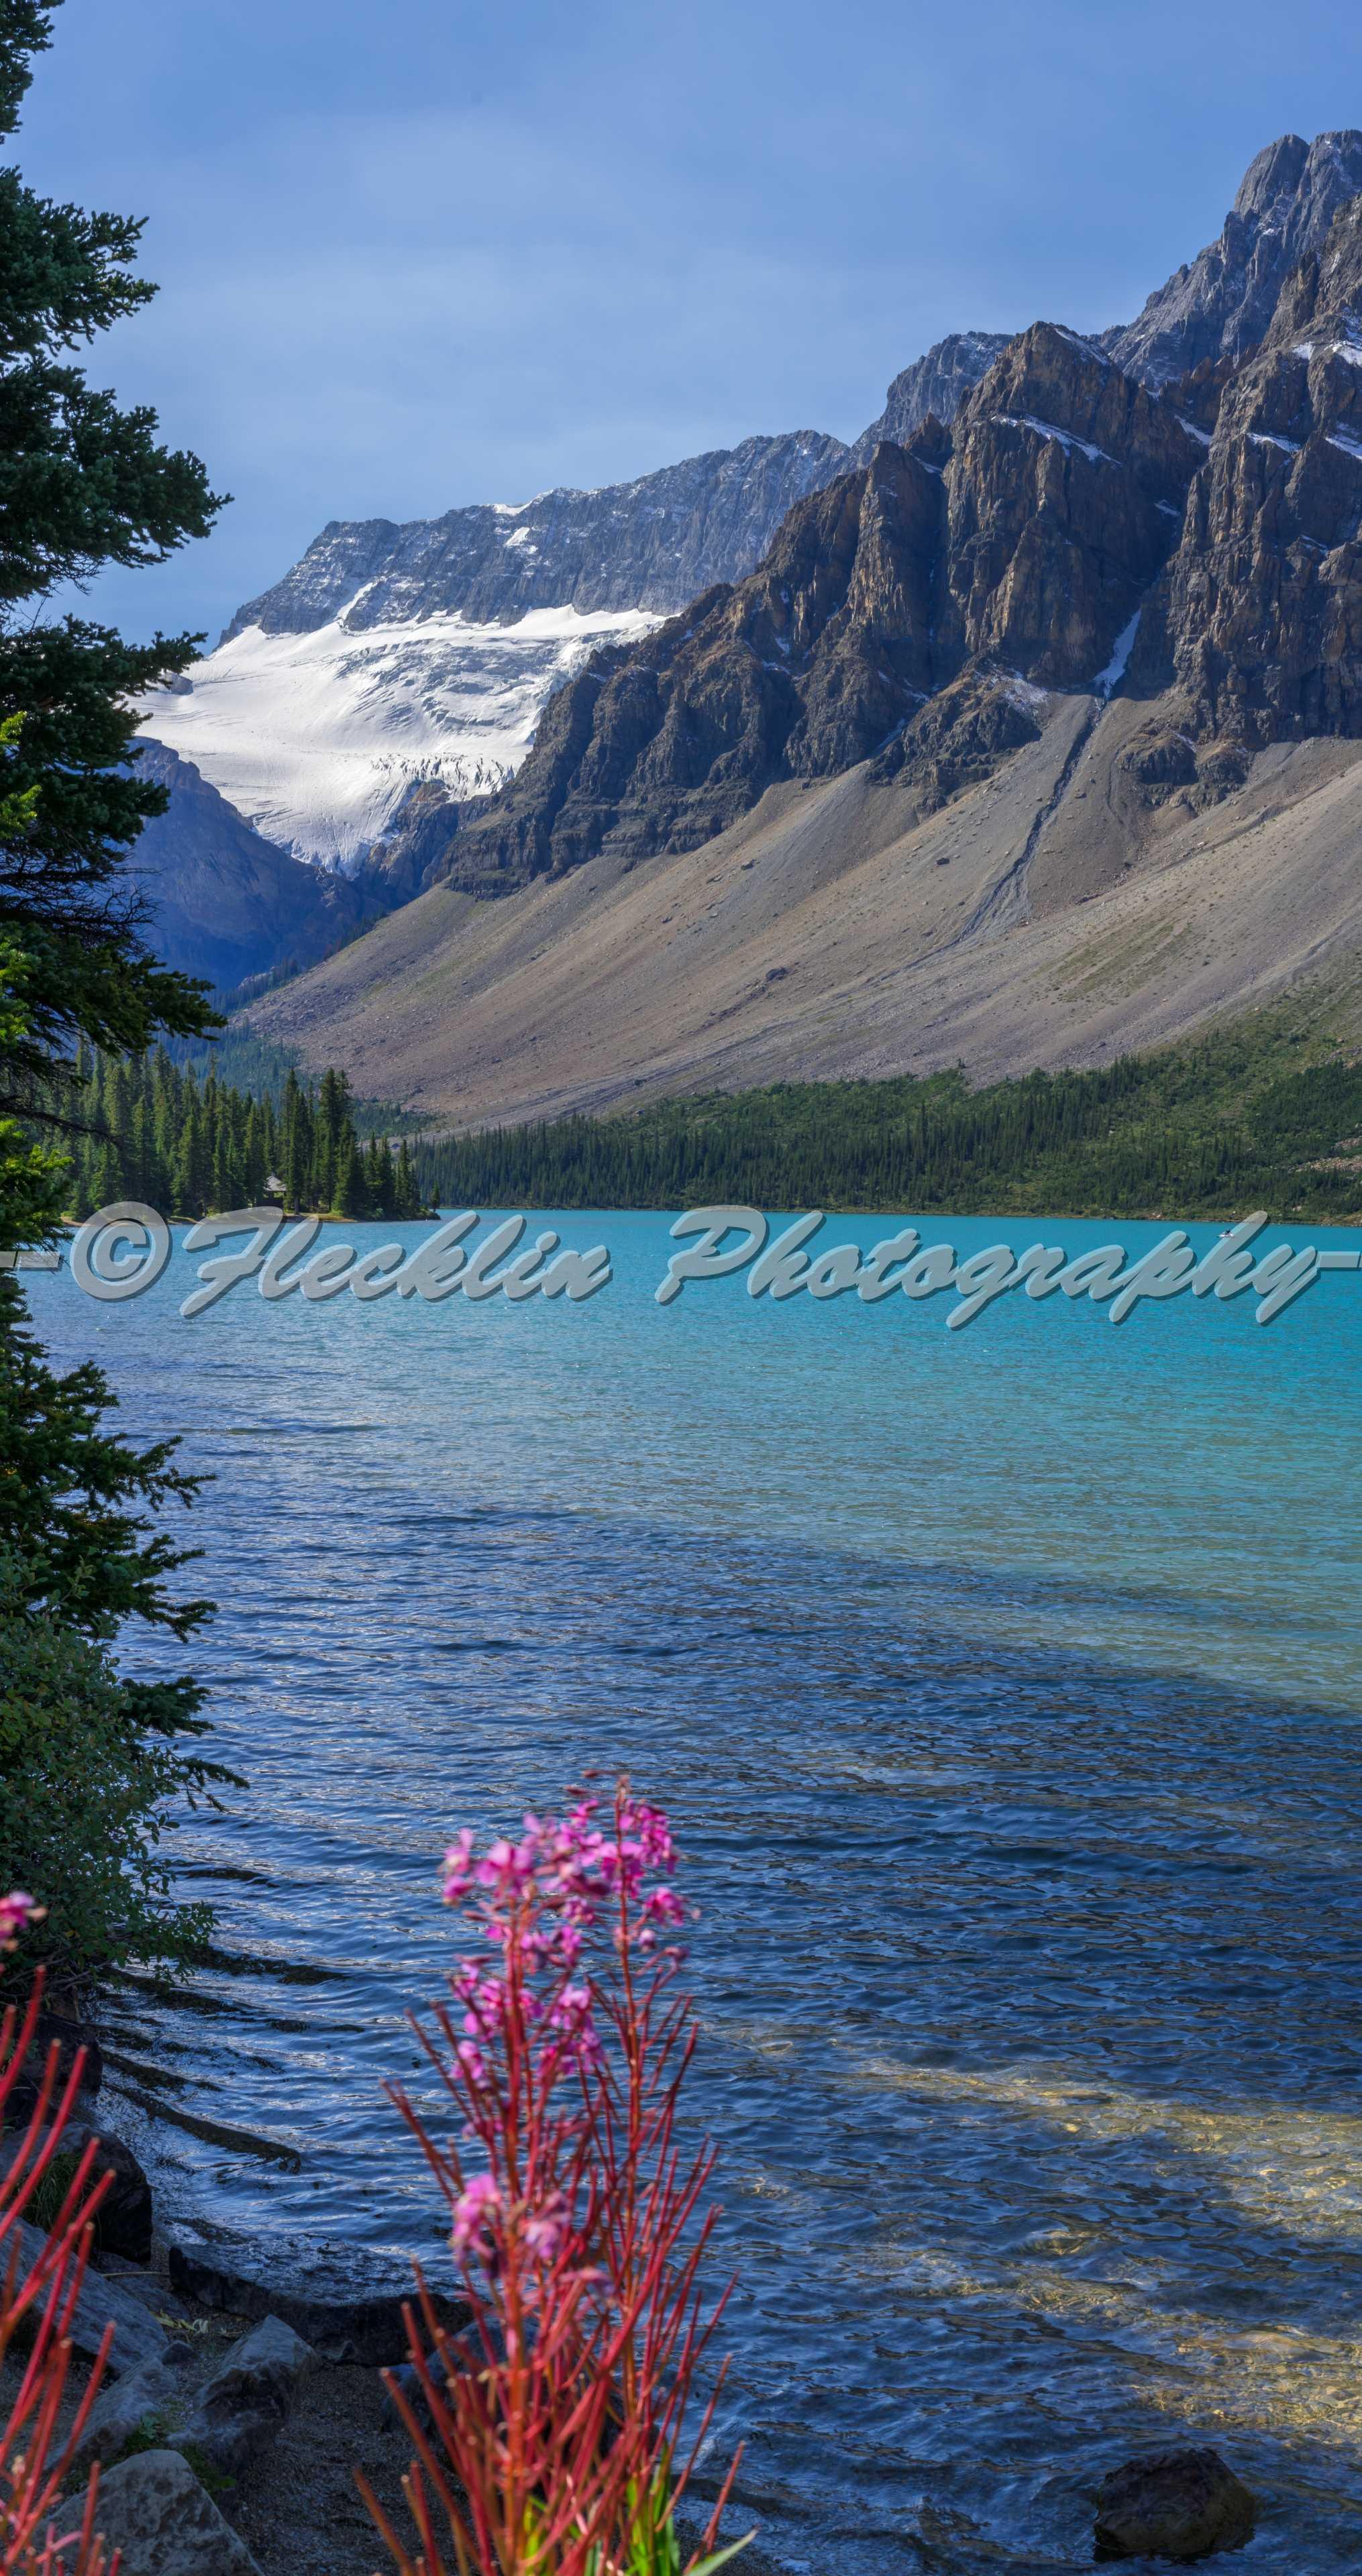 Bow Lake Banff National Park stock photo  iStock